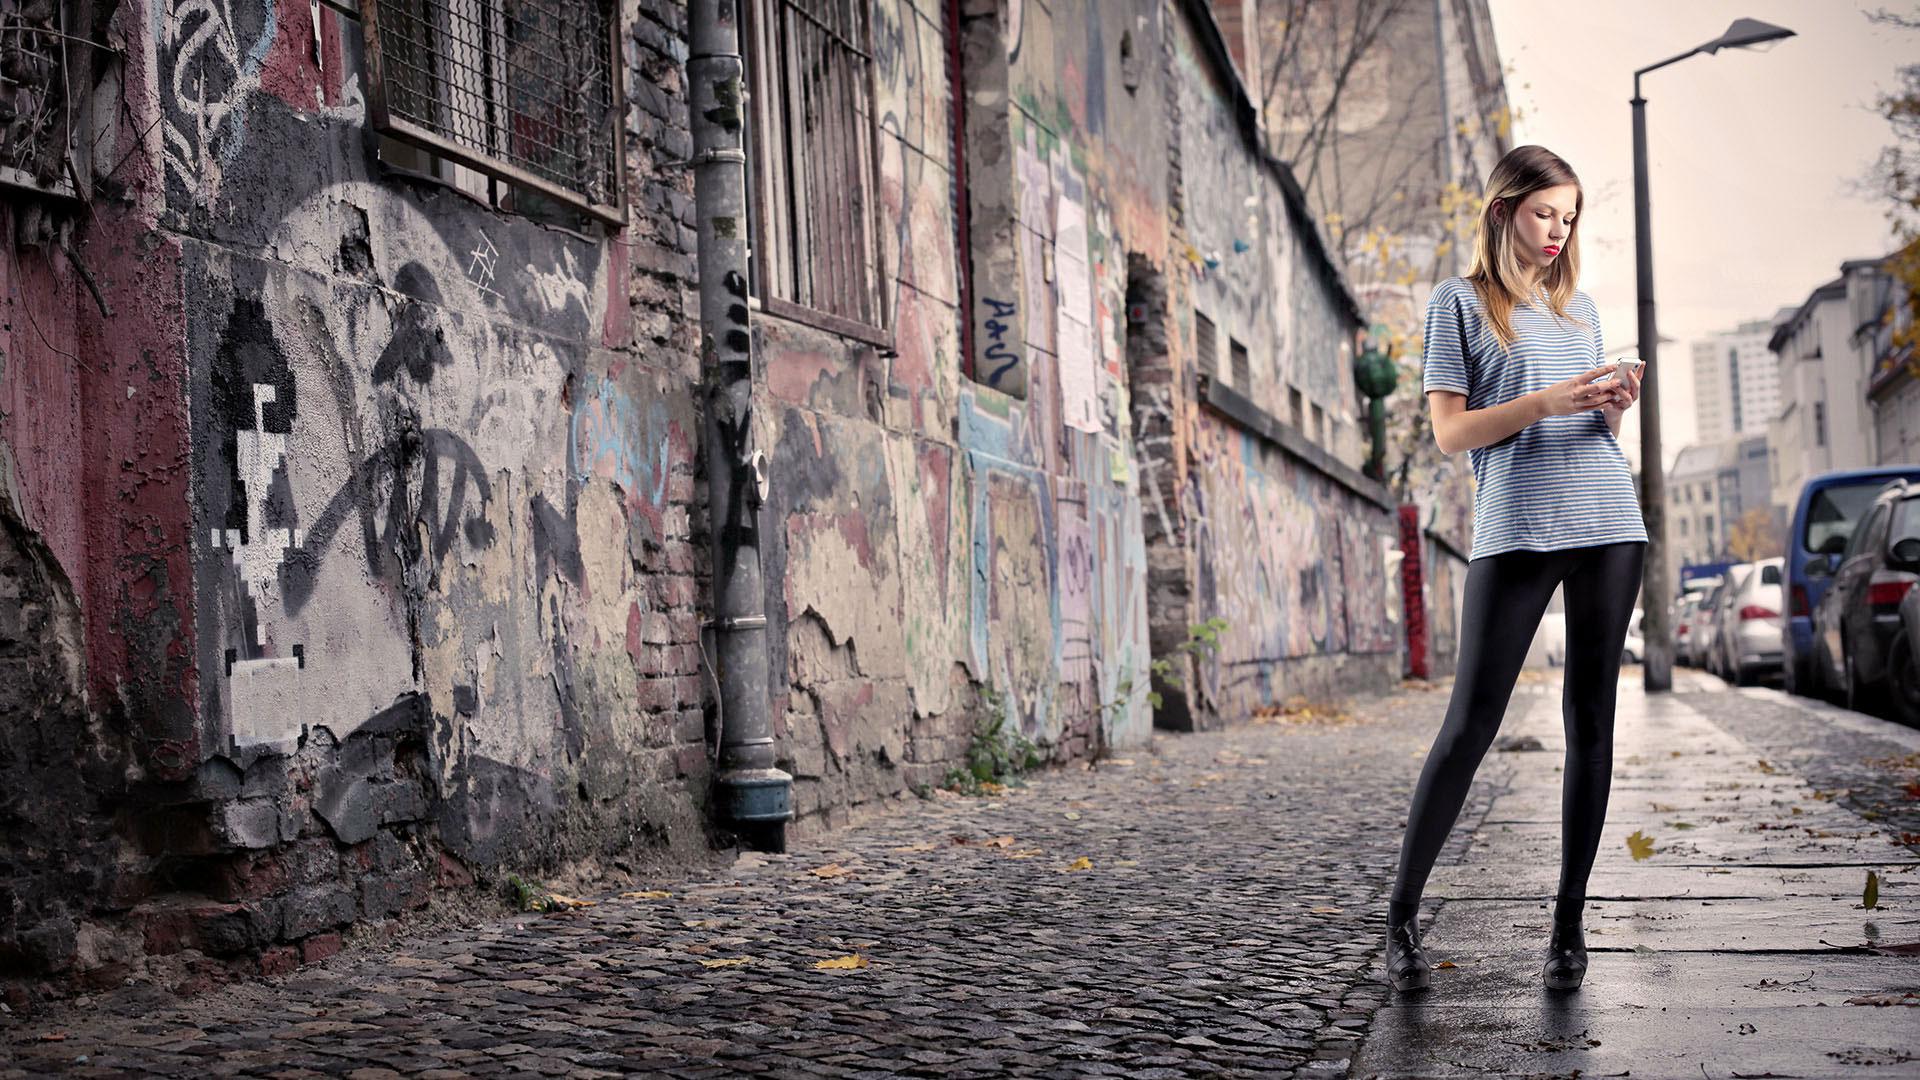 Девушки в леггинсах по улице фото